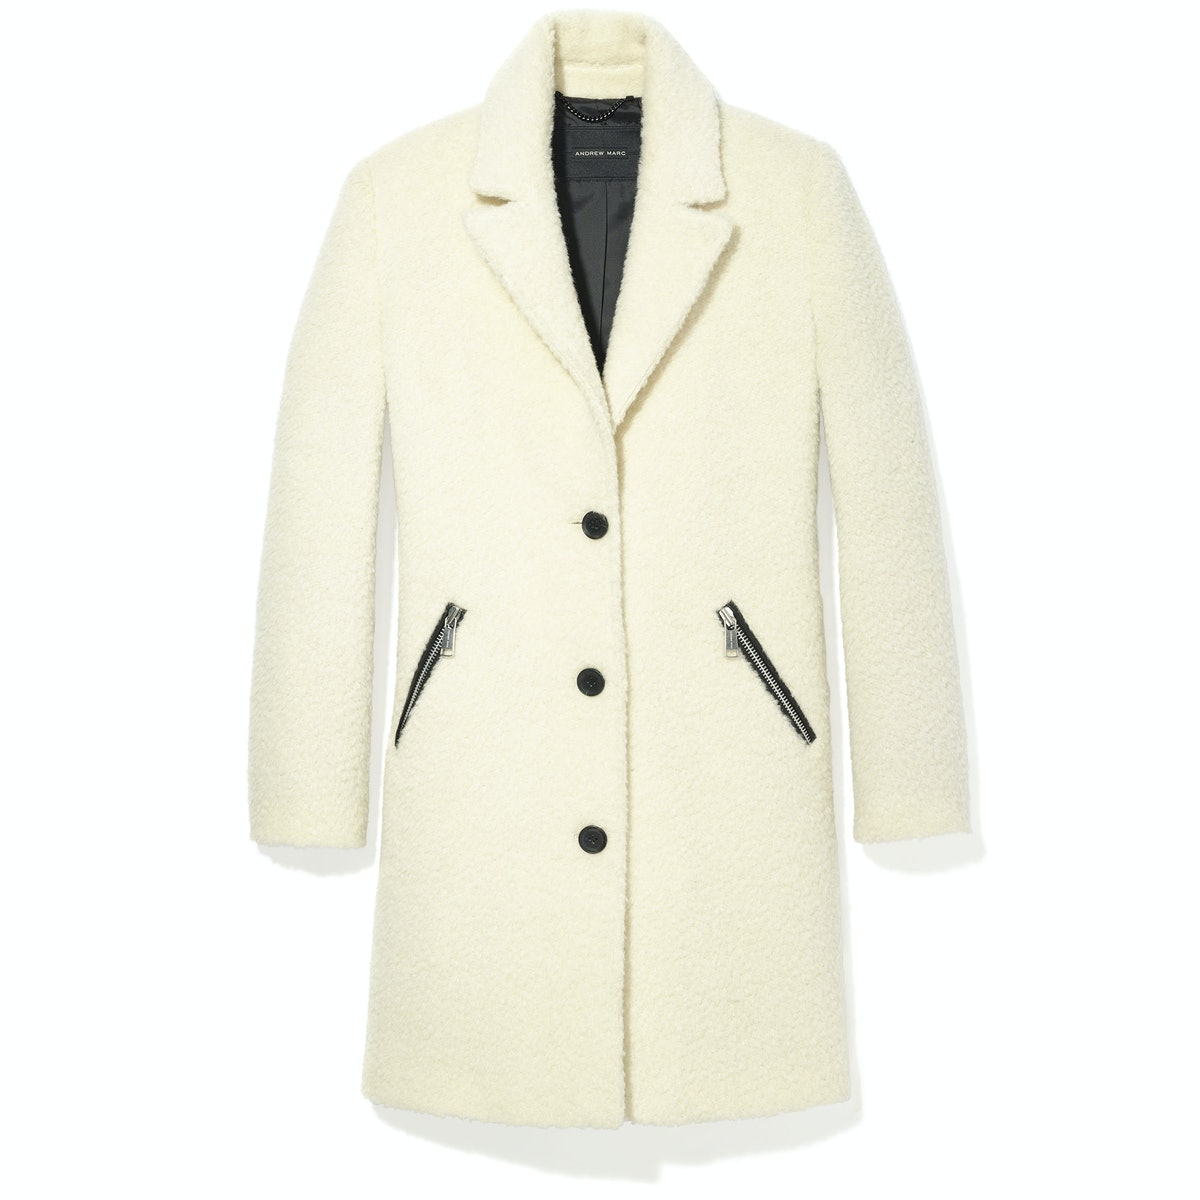 Andrew Marc coat